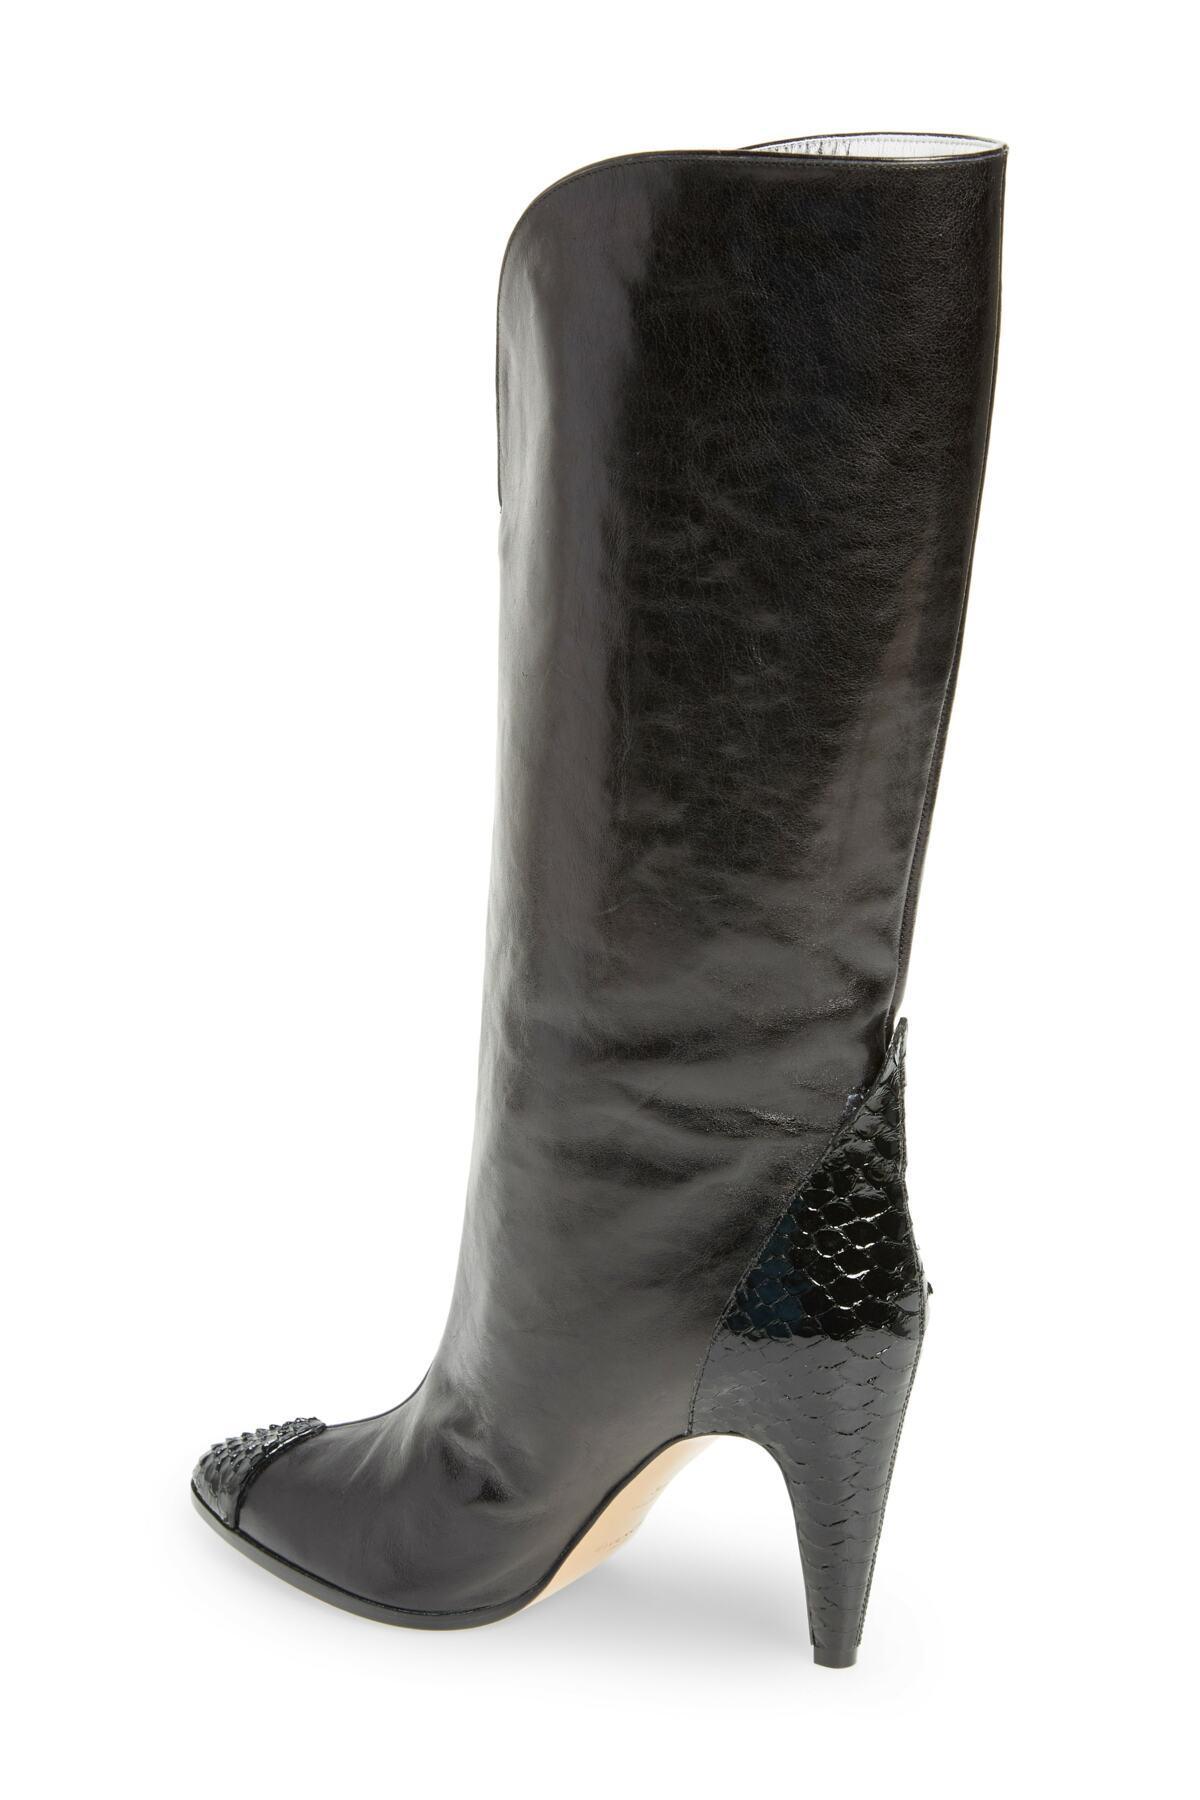 9c6affdcd68 Givenchy Black Kangaroo Leather & Genuine Python Boot (women)